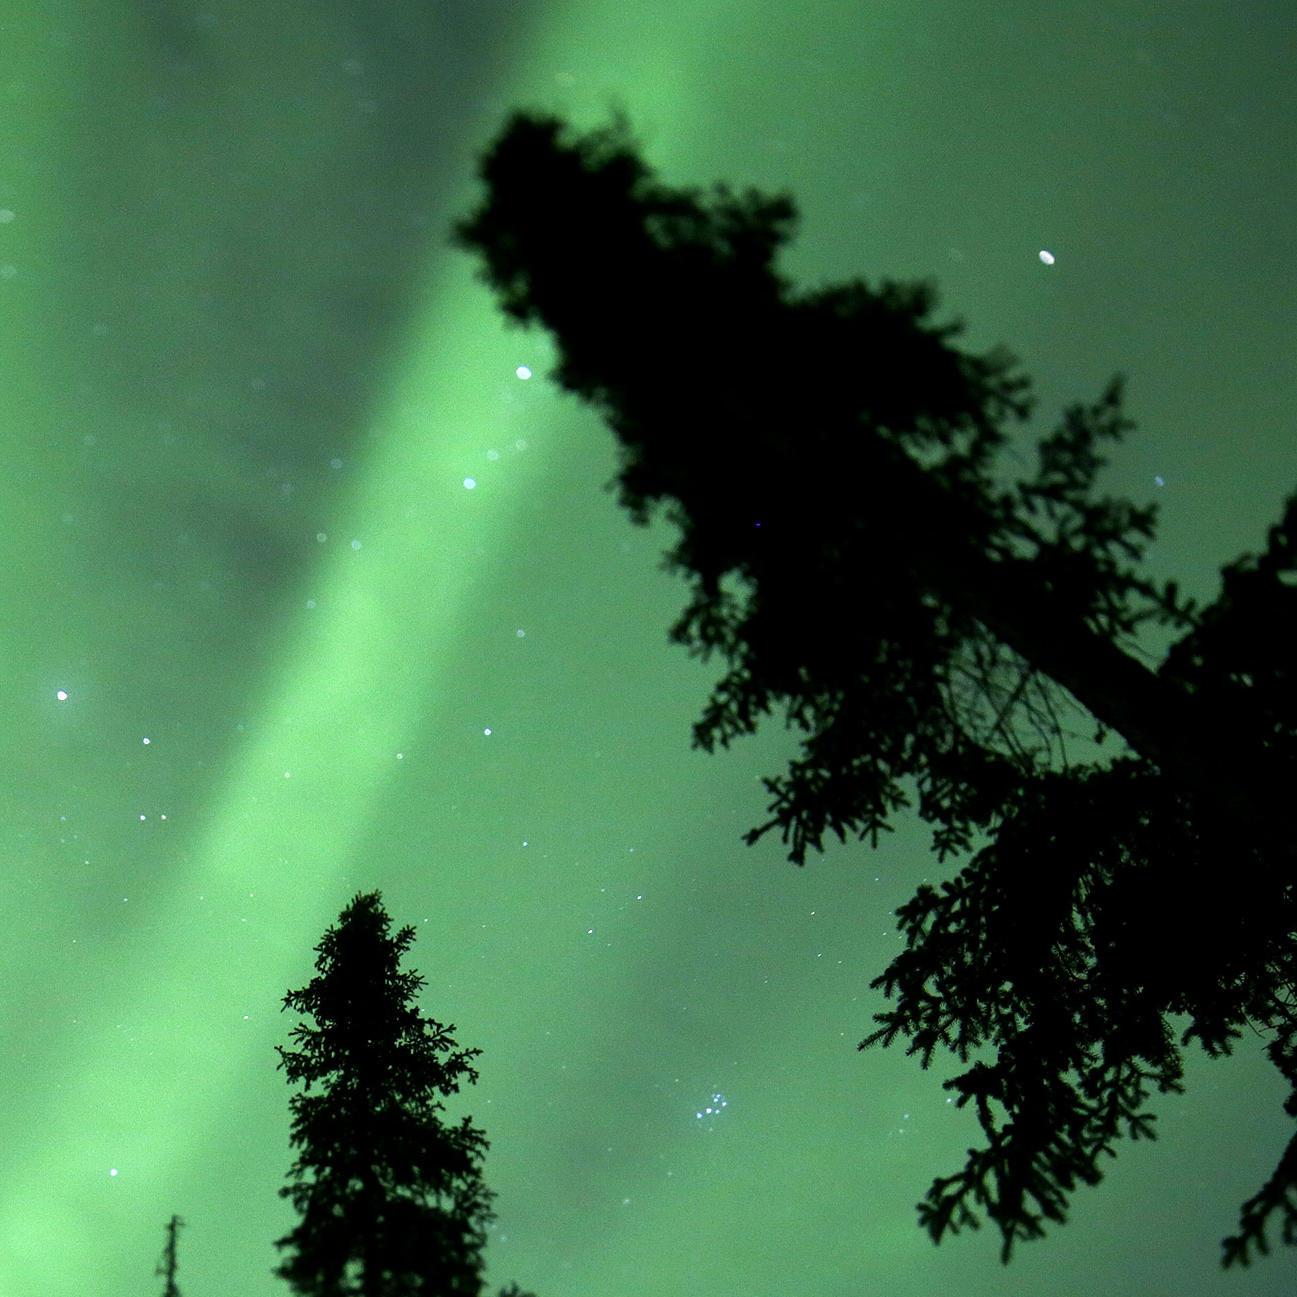 Bonus Scenes - The Last Alaskans